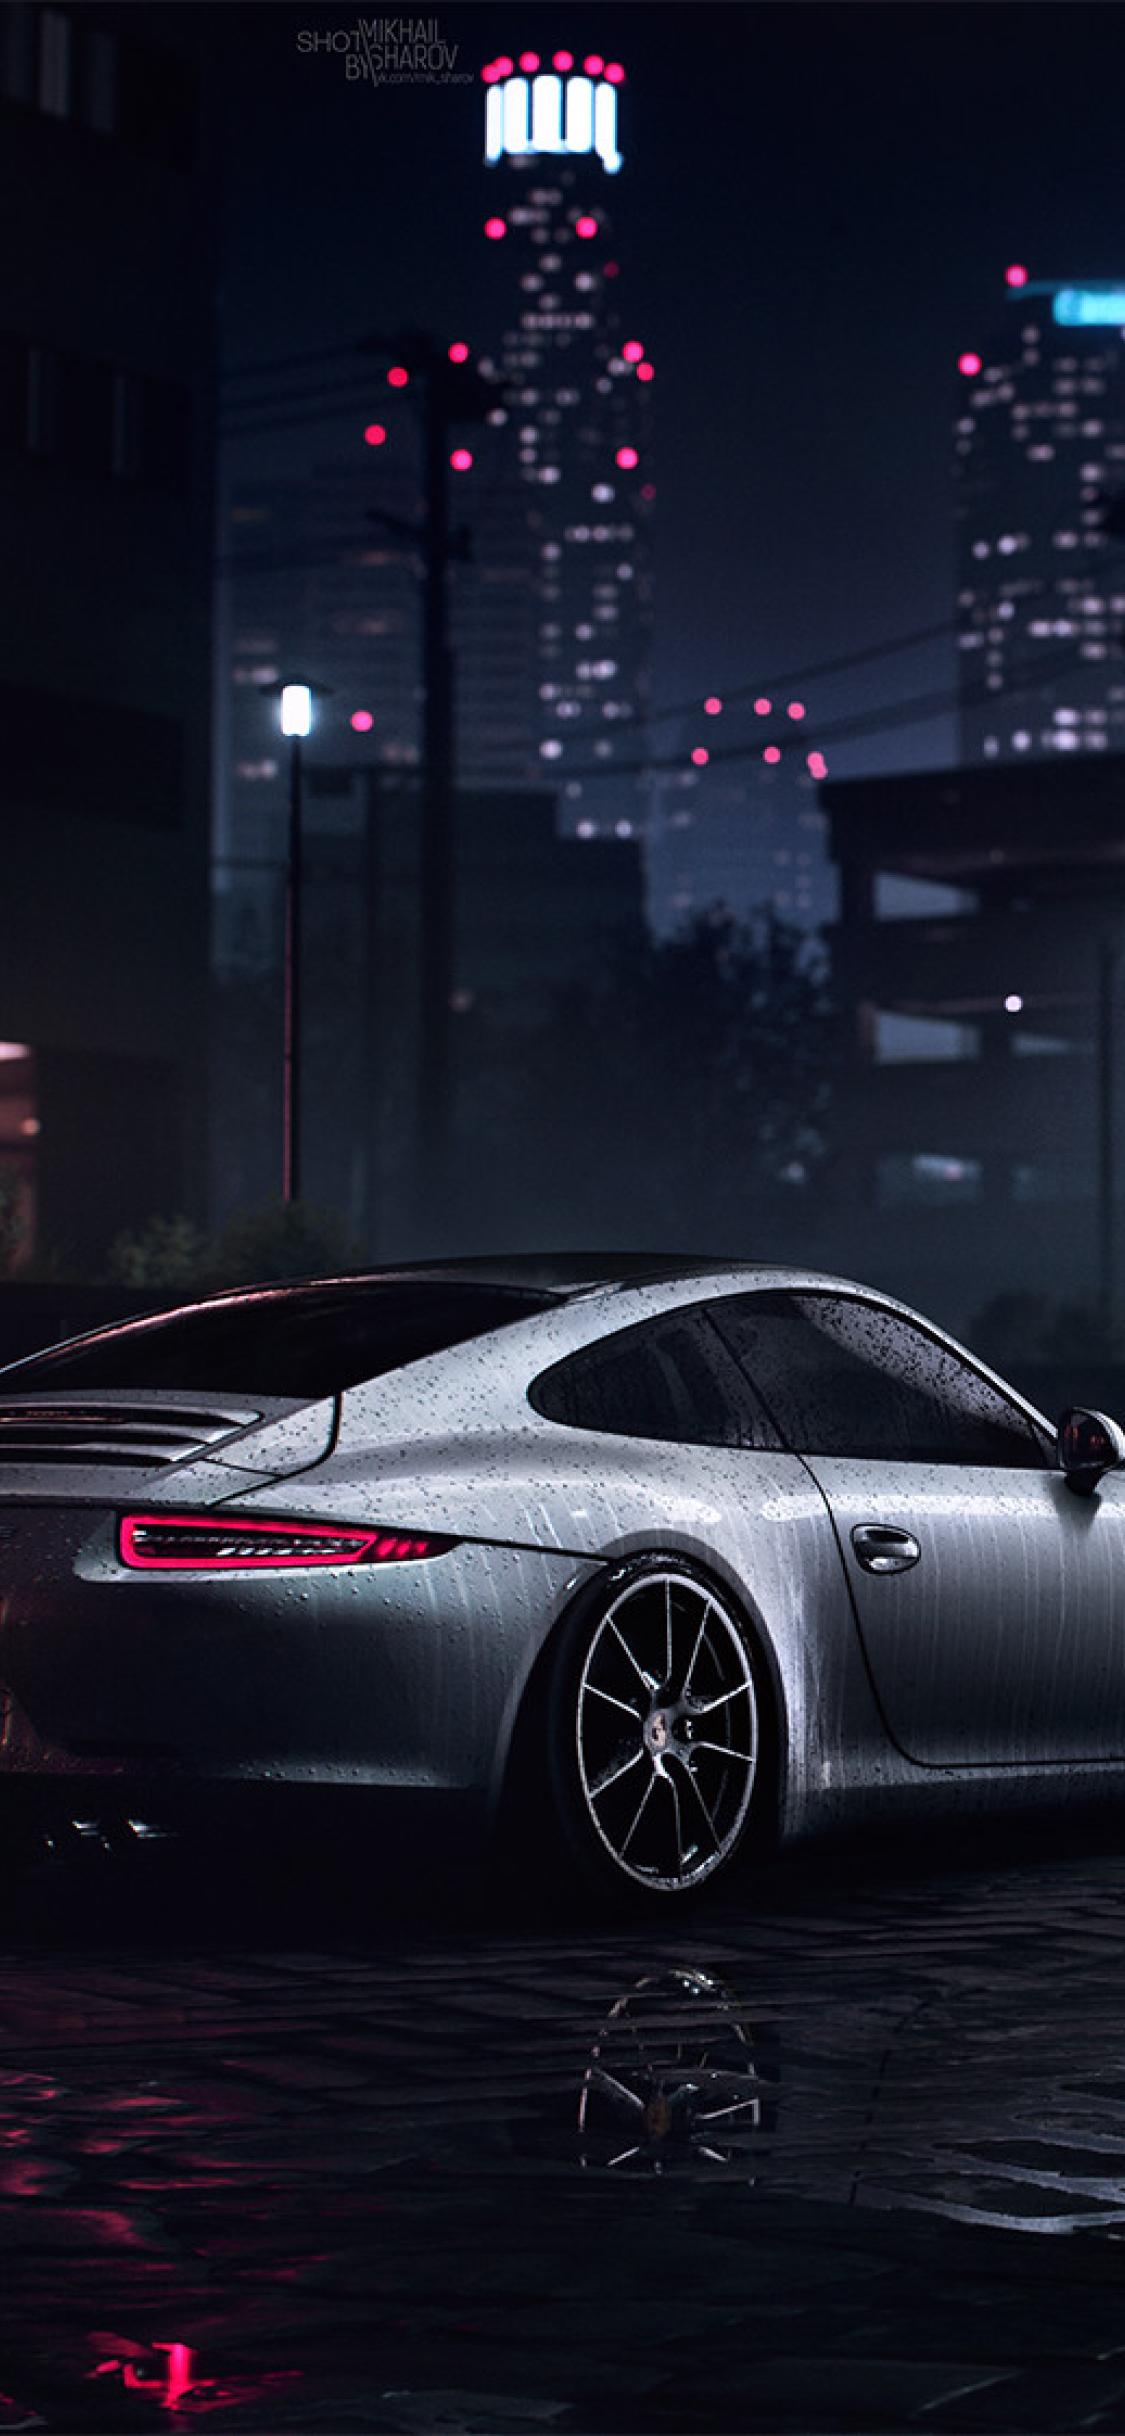 1125x2436 Porsche 911 Carrera S Need For Speed Iphone Xs Iphone 10